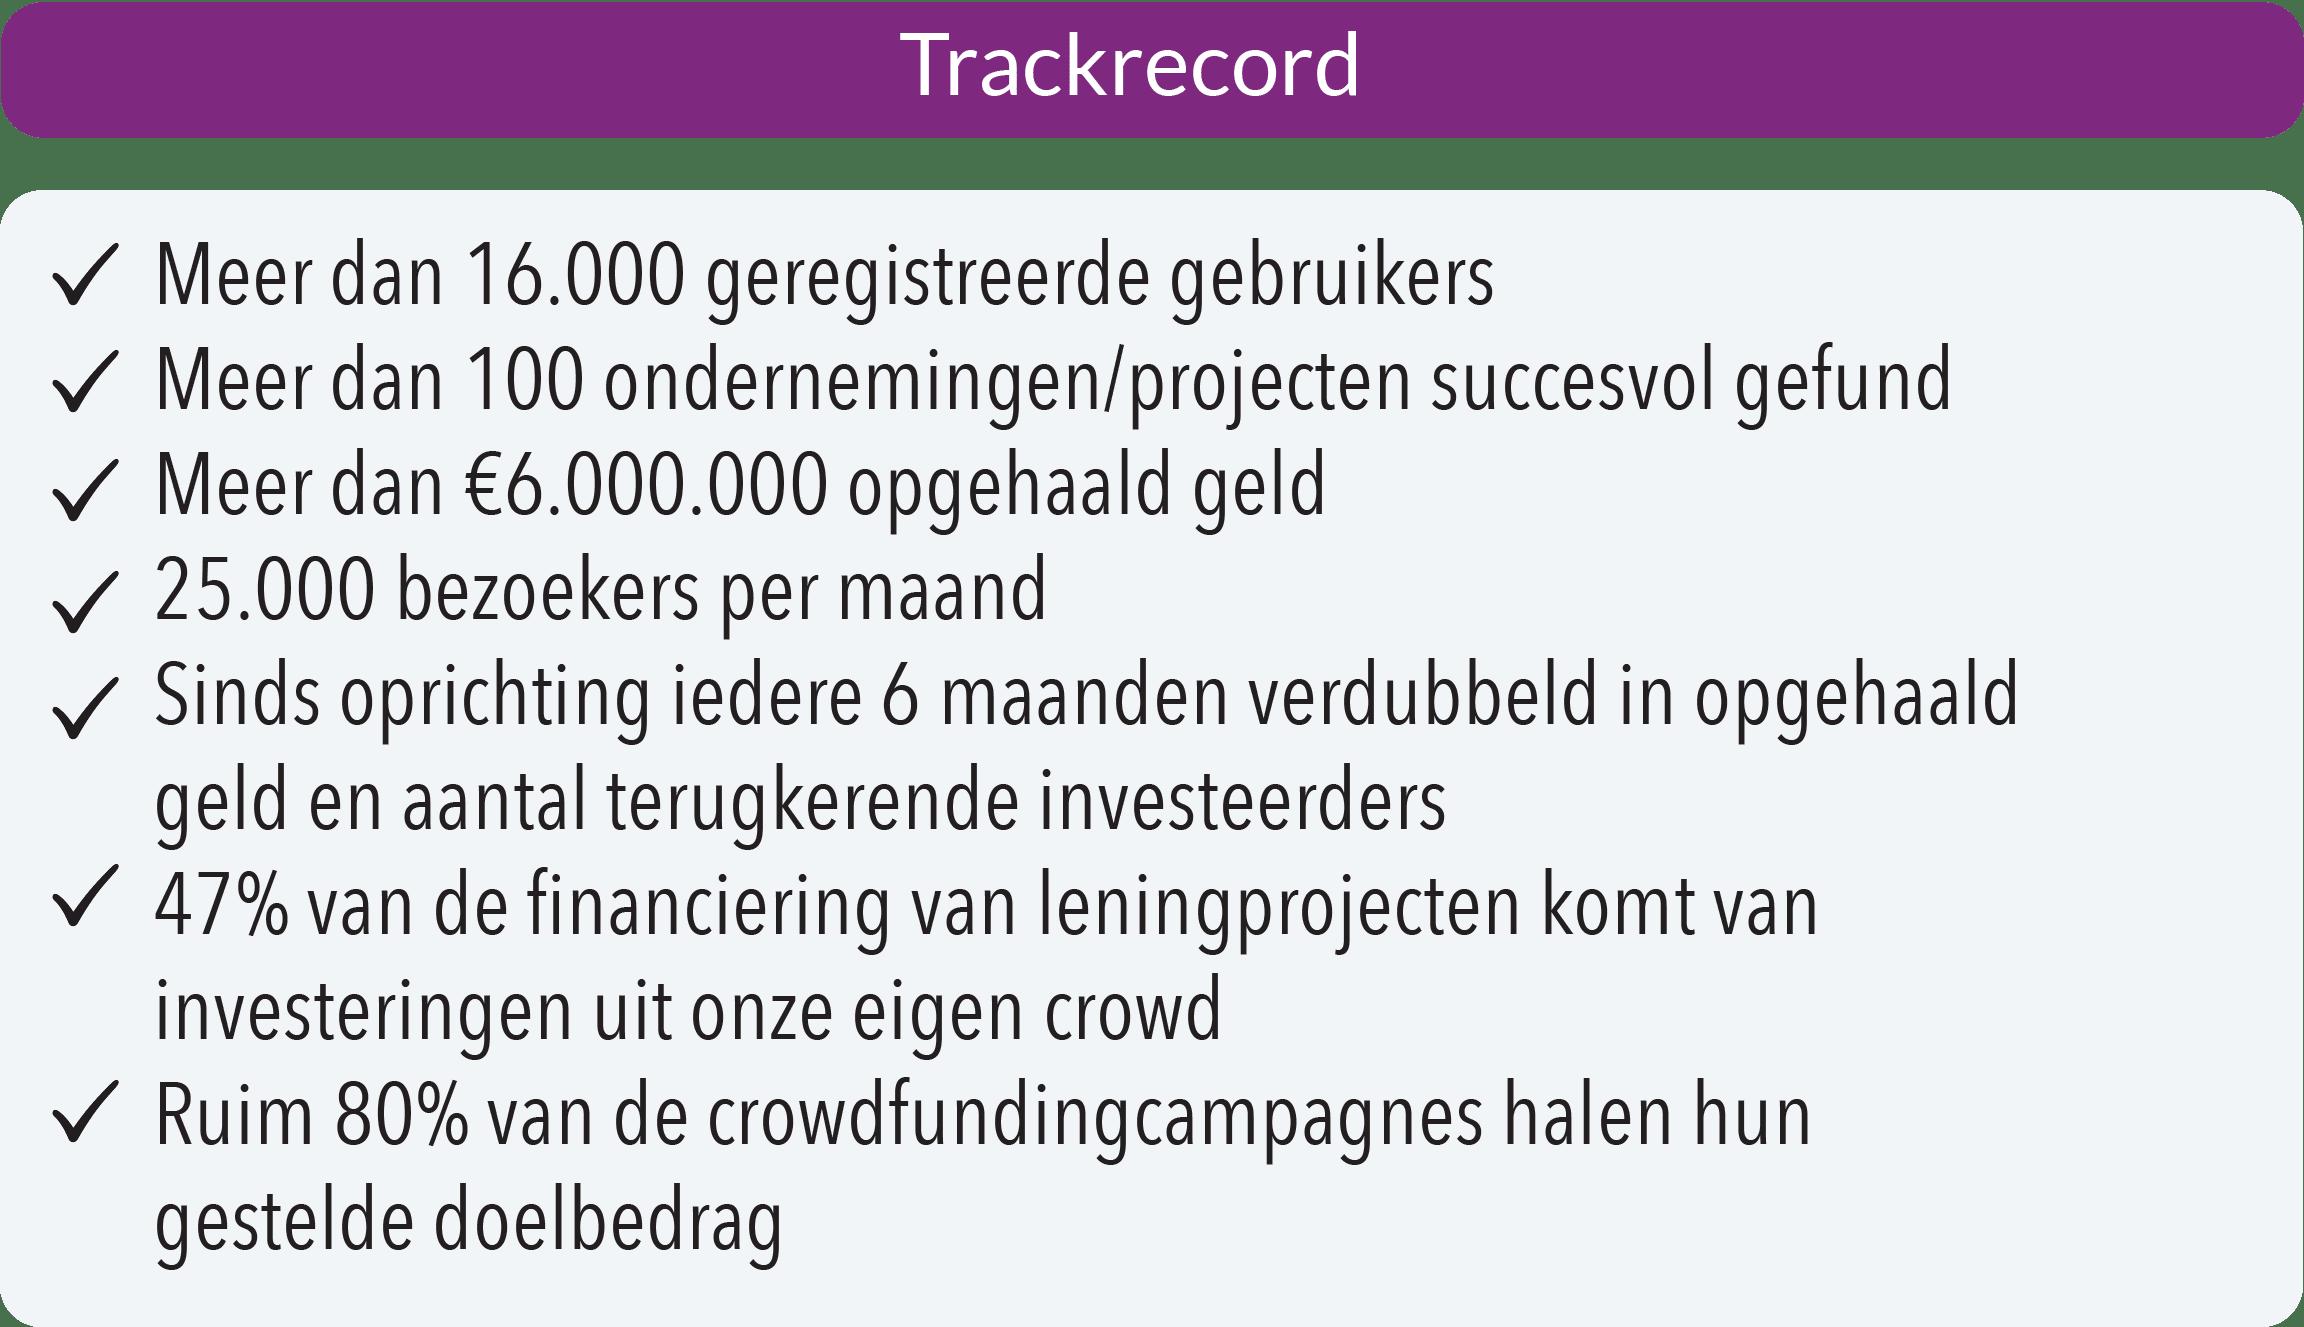 Trackrecord Oneplanetcrowd